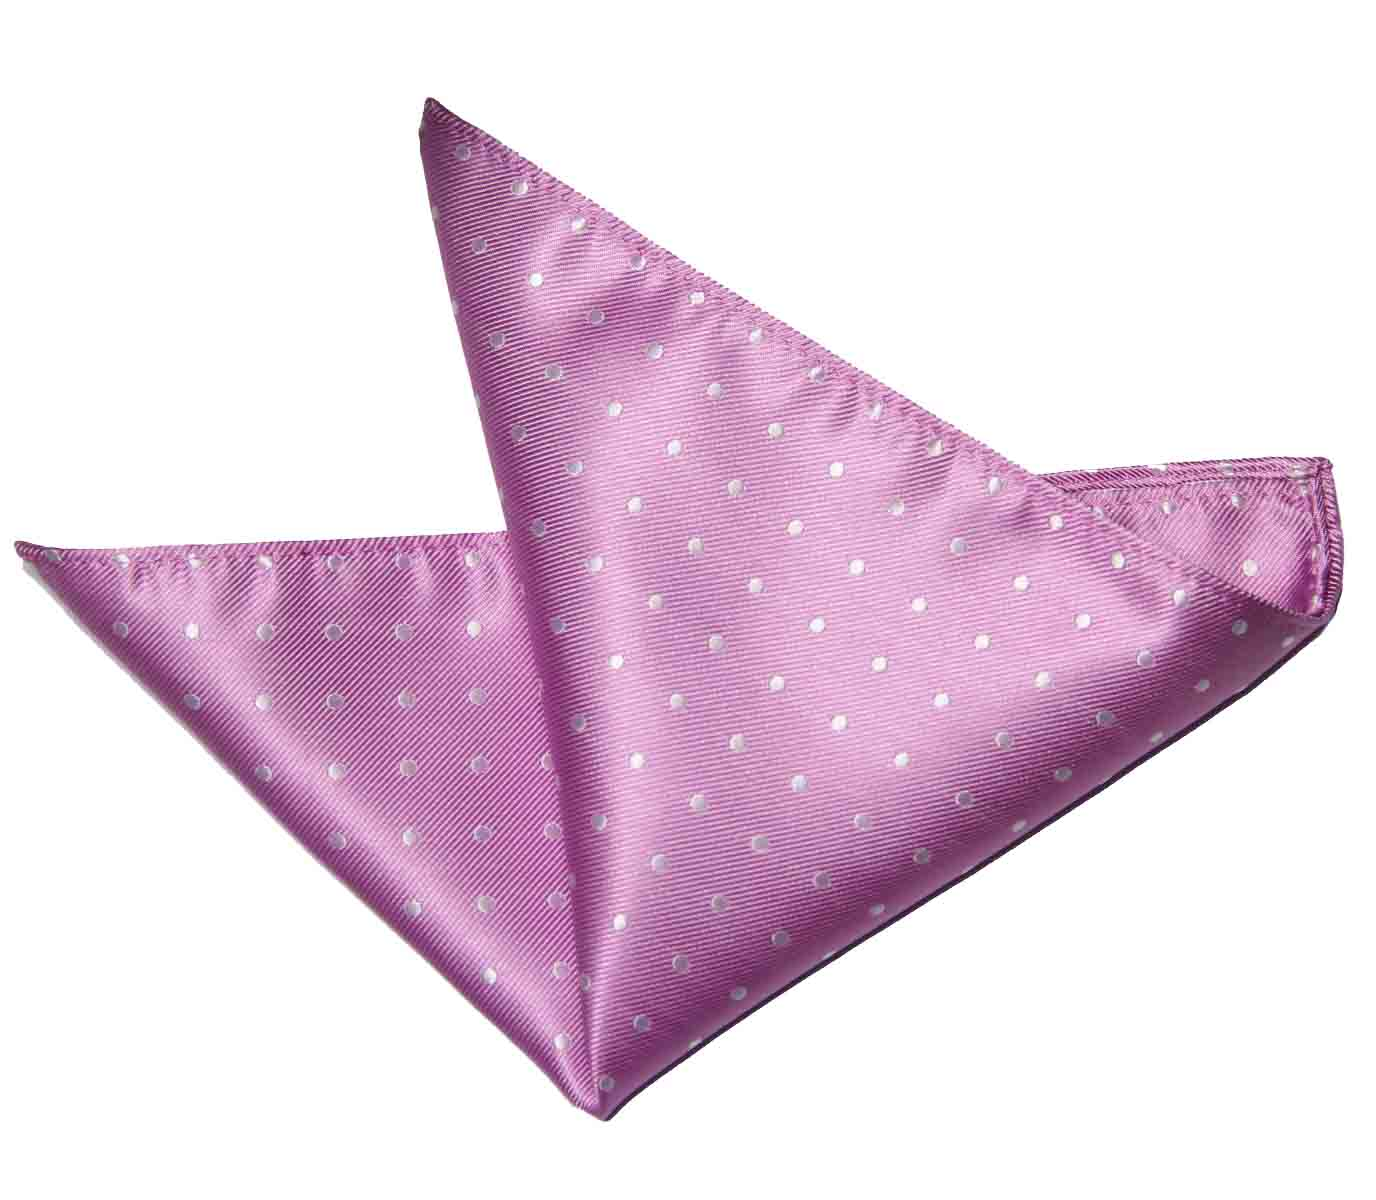 ekSel Pocket Square Pink White Polka Dot Men's